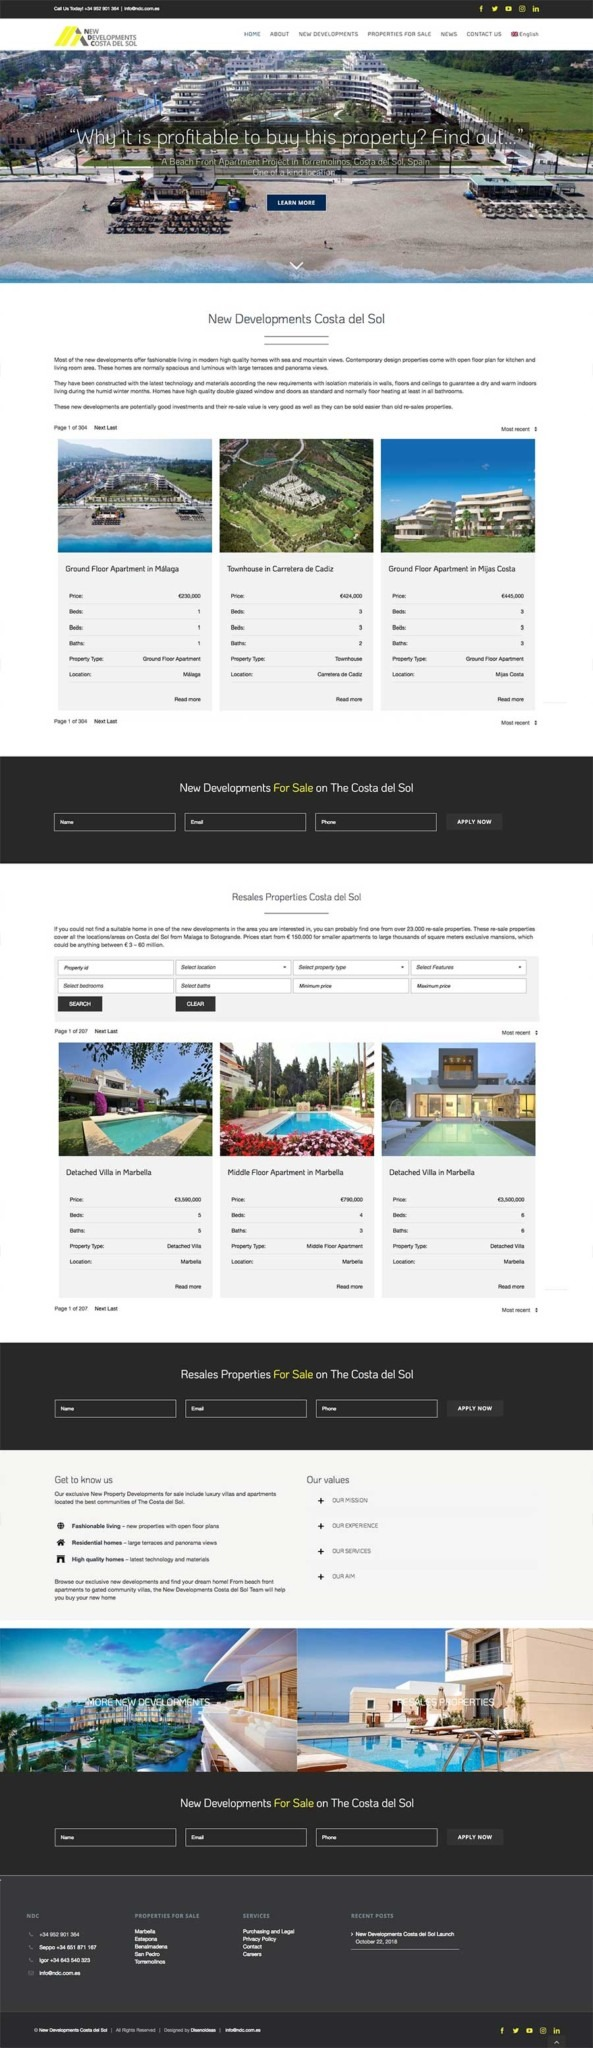 new-developments-costa-del-sol-real-estate-costa-del-sol-new-developments